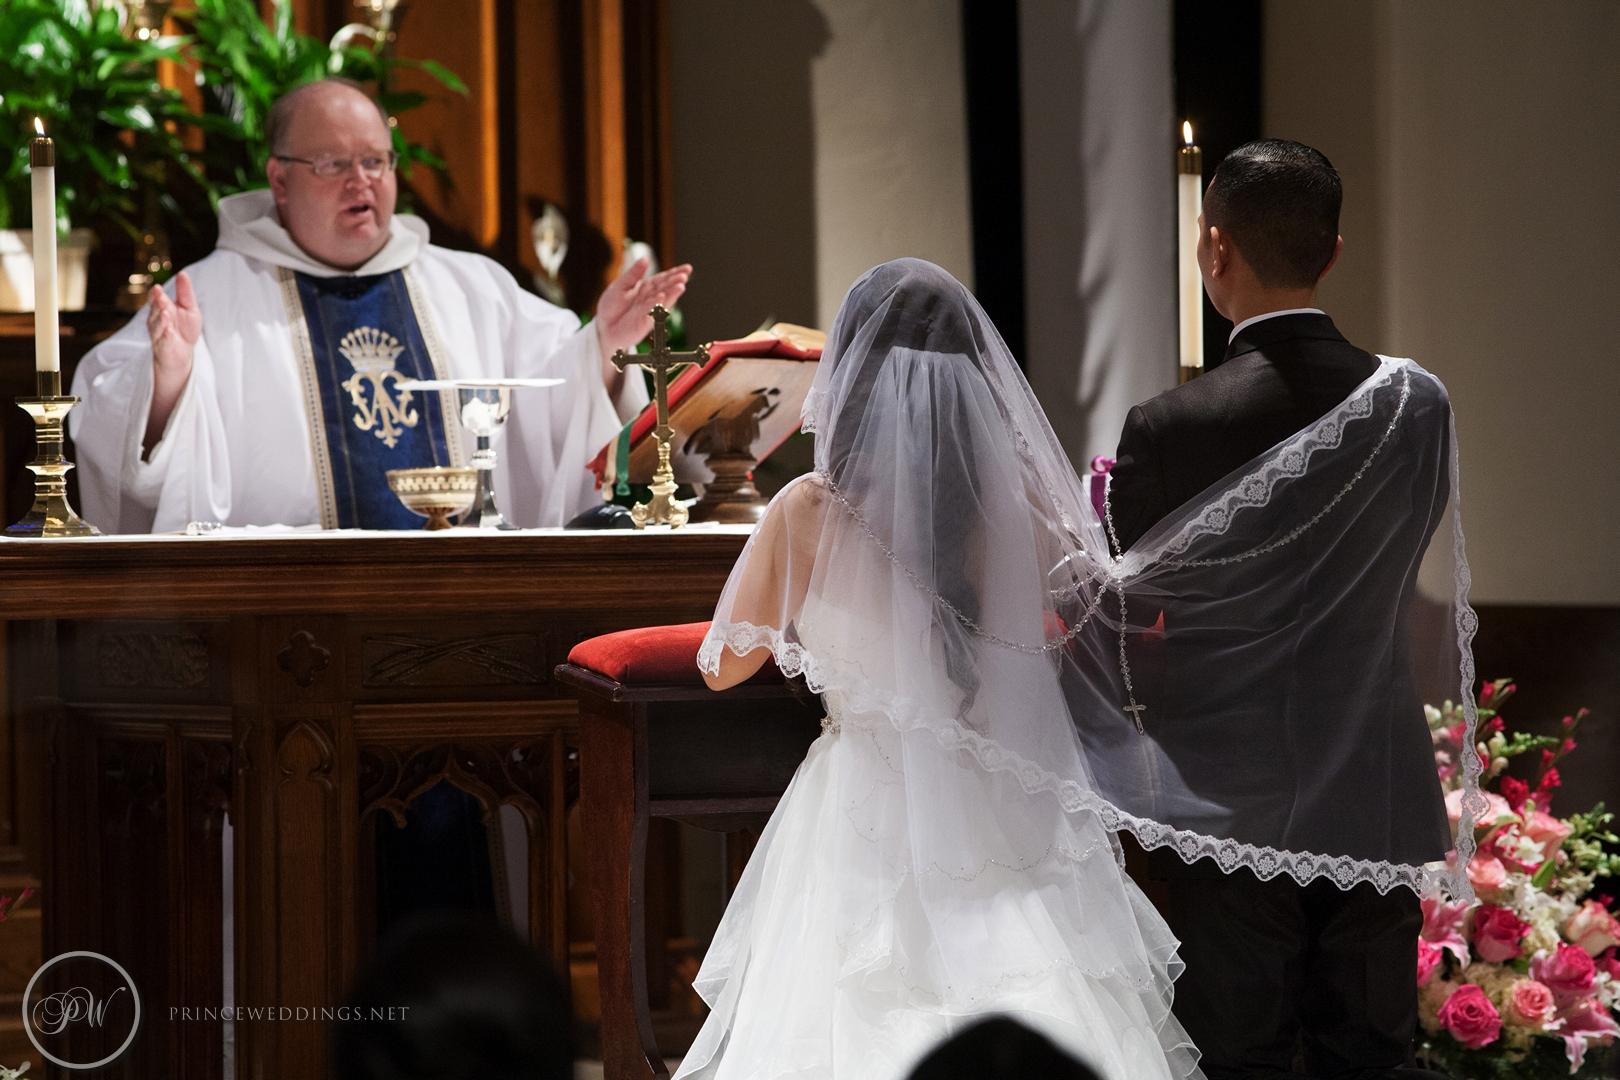 Castaway_Burbank_Wedding_Photo_Christian_Autumn034.jpg